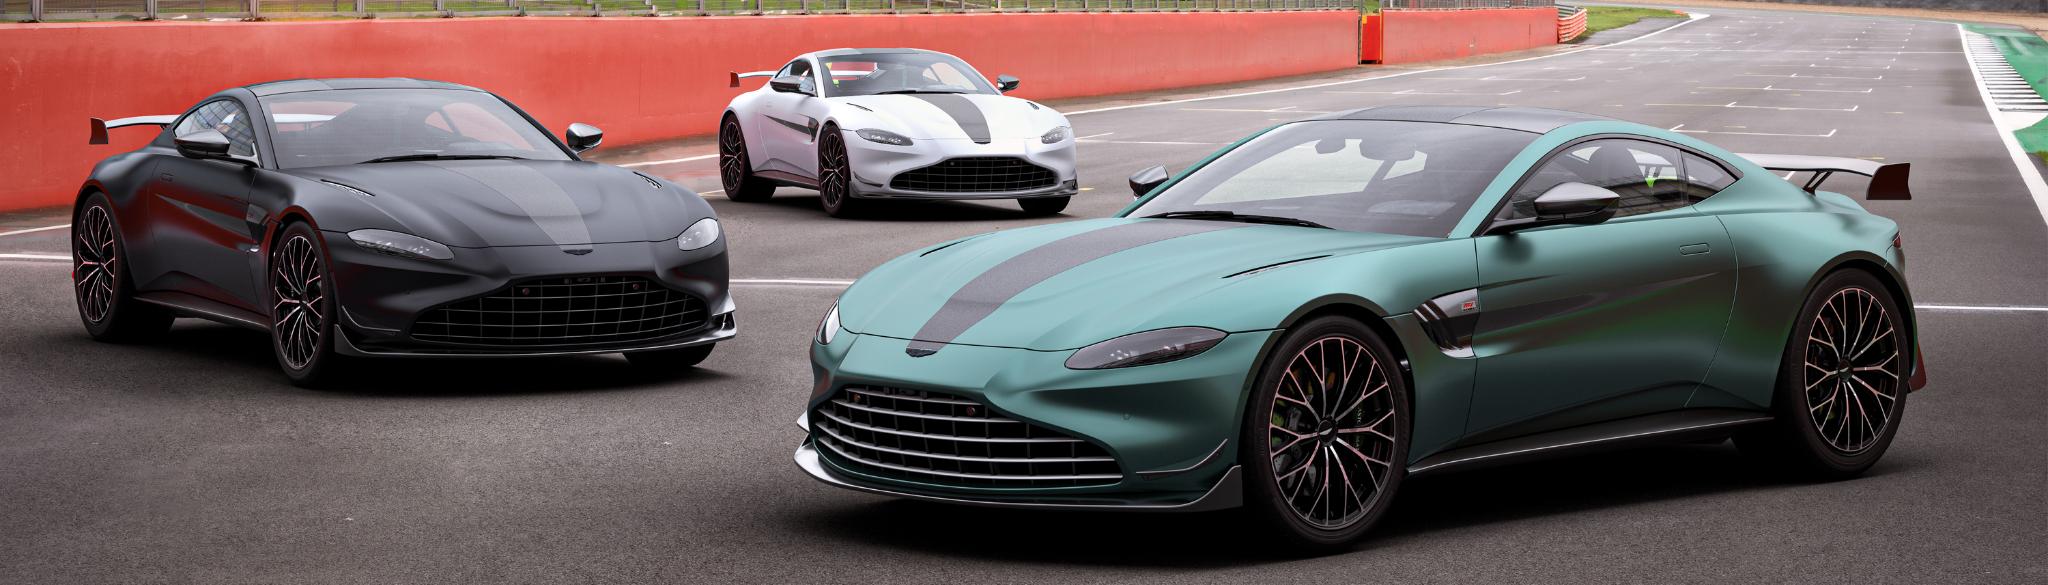 F1 Edition Aston Martin